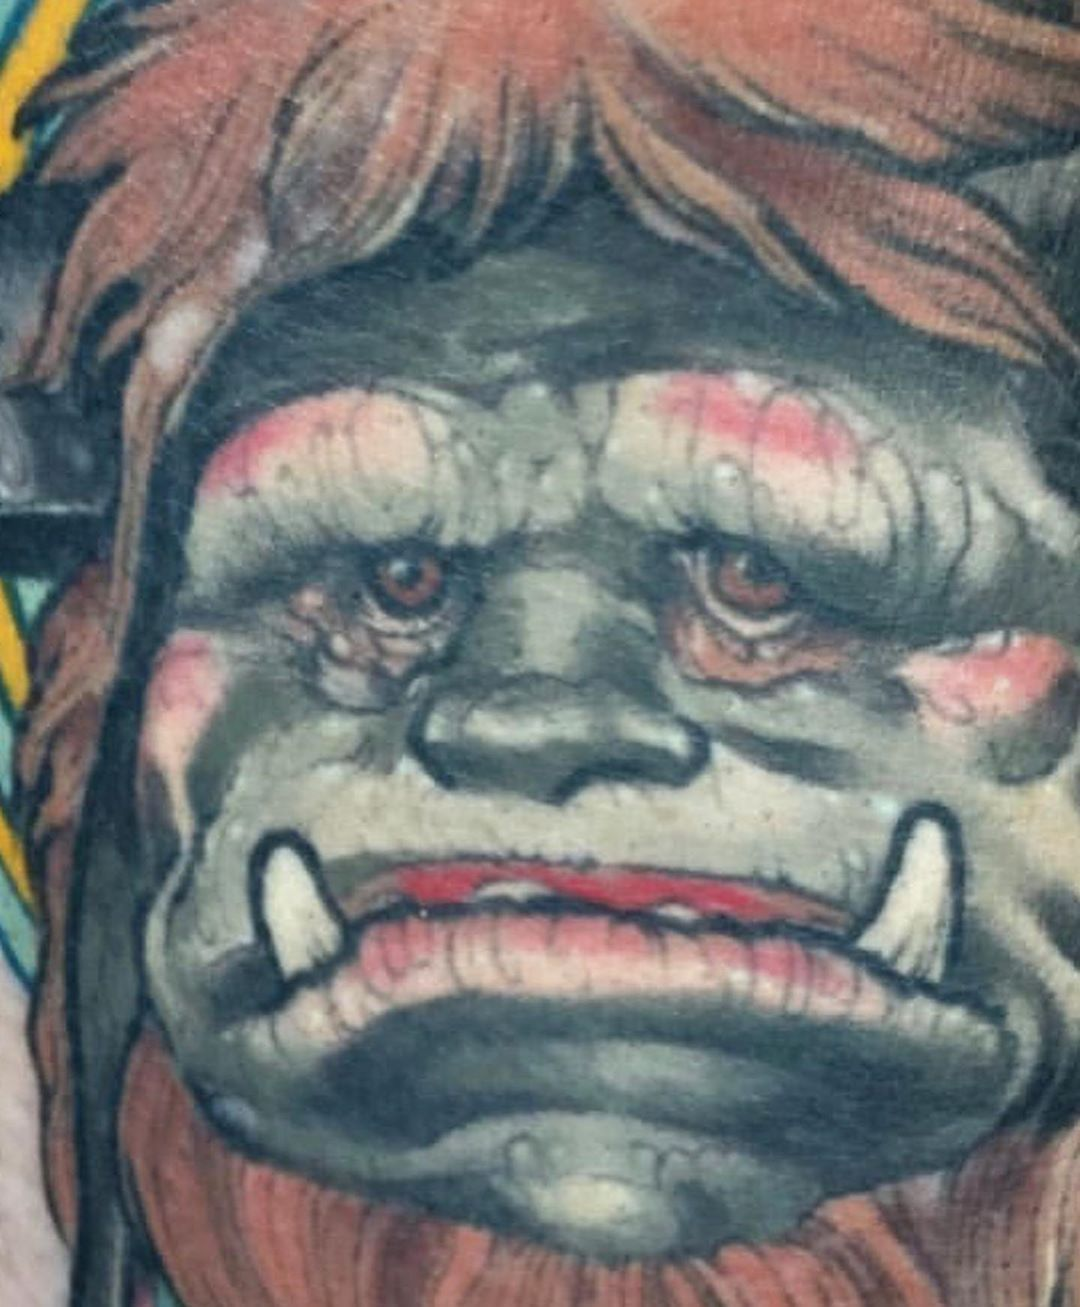 Healed* almost two years I think?  #labrynth . . . #tattoo #tattoos #darktattoos #neotrad #neotraditional #neotraditionaltattoo #tattooart #tattooartist #tattoodesign #darktattoos #tattooartistmagazine #girlswithtattoos #phillytattoo #philadelphiatattoo #phillytattoos #delawaretattoo #newjerseytattoo #tattooart #tattooartist #tattoodesign#solidink #newtraditional #besttattoos #darkartists #tattoosnob#neotradsub #neotradworldwide @kingpintattoosupply@eikondevice@skinart_mag@tattoosnob @neotraditi